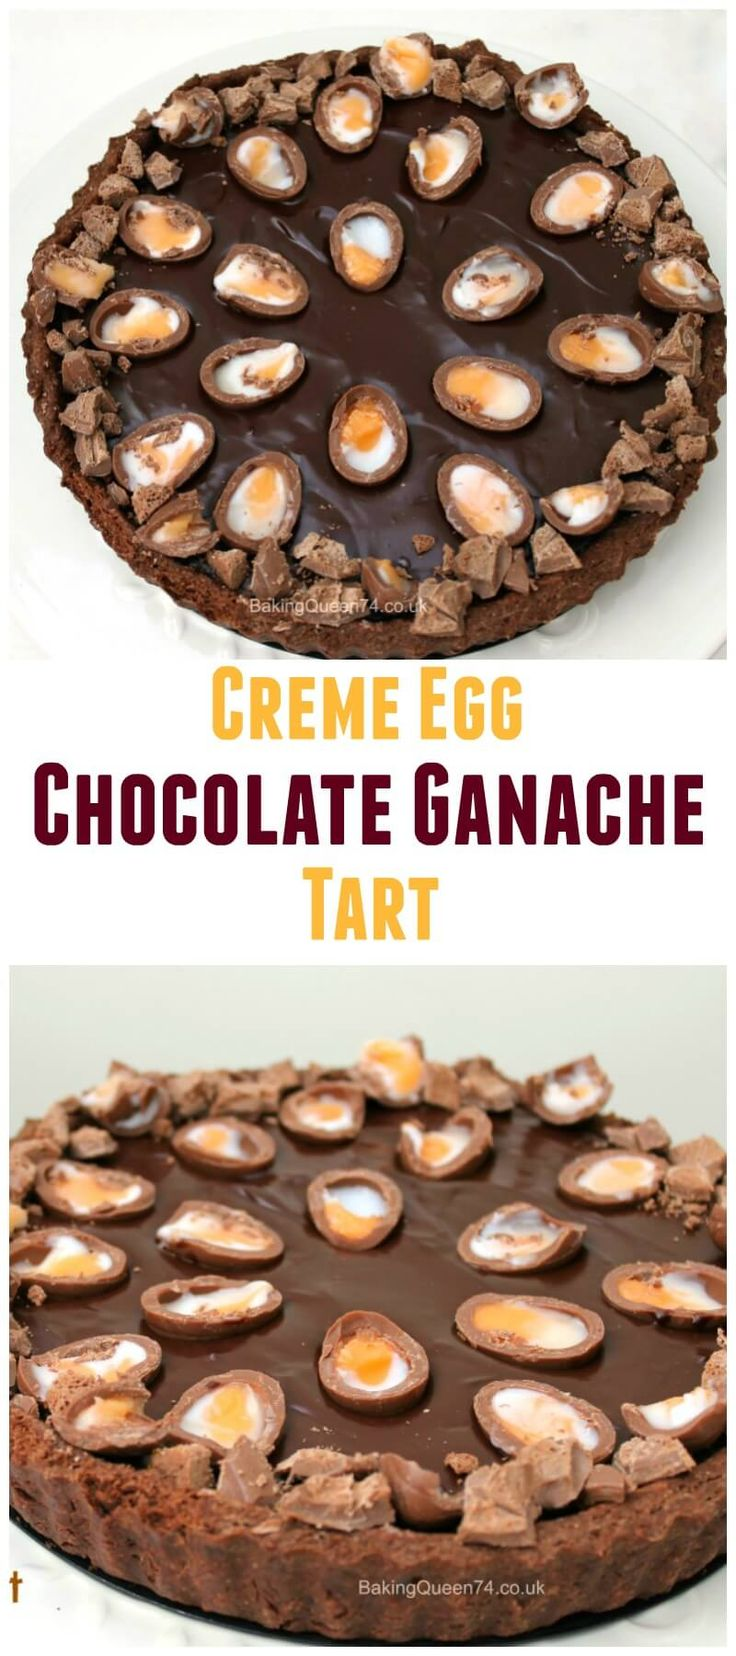 Creme Egg chocolate ganache tart - a wonderfully indulgent Easter dessert!